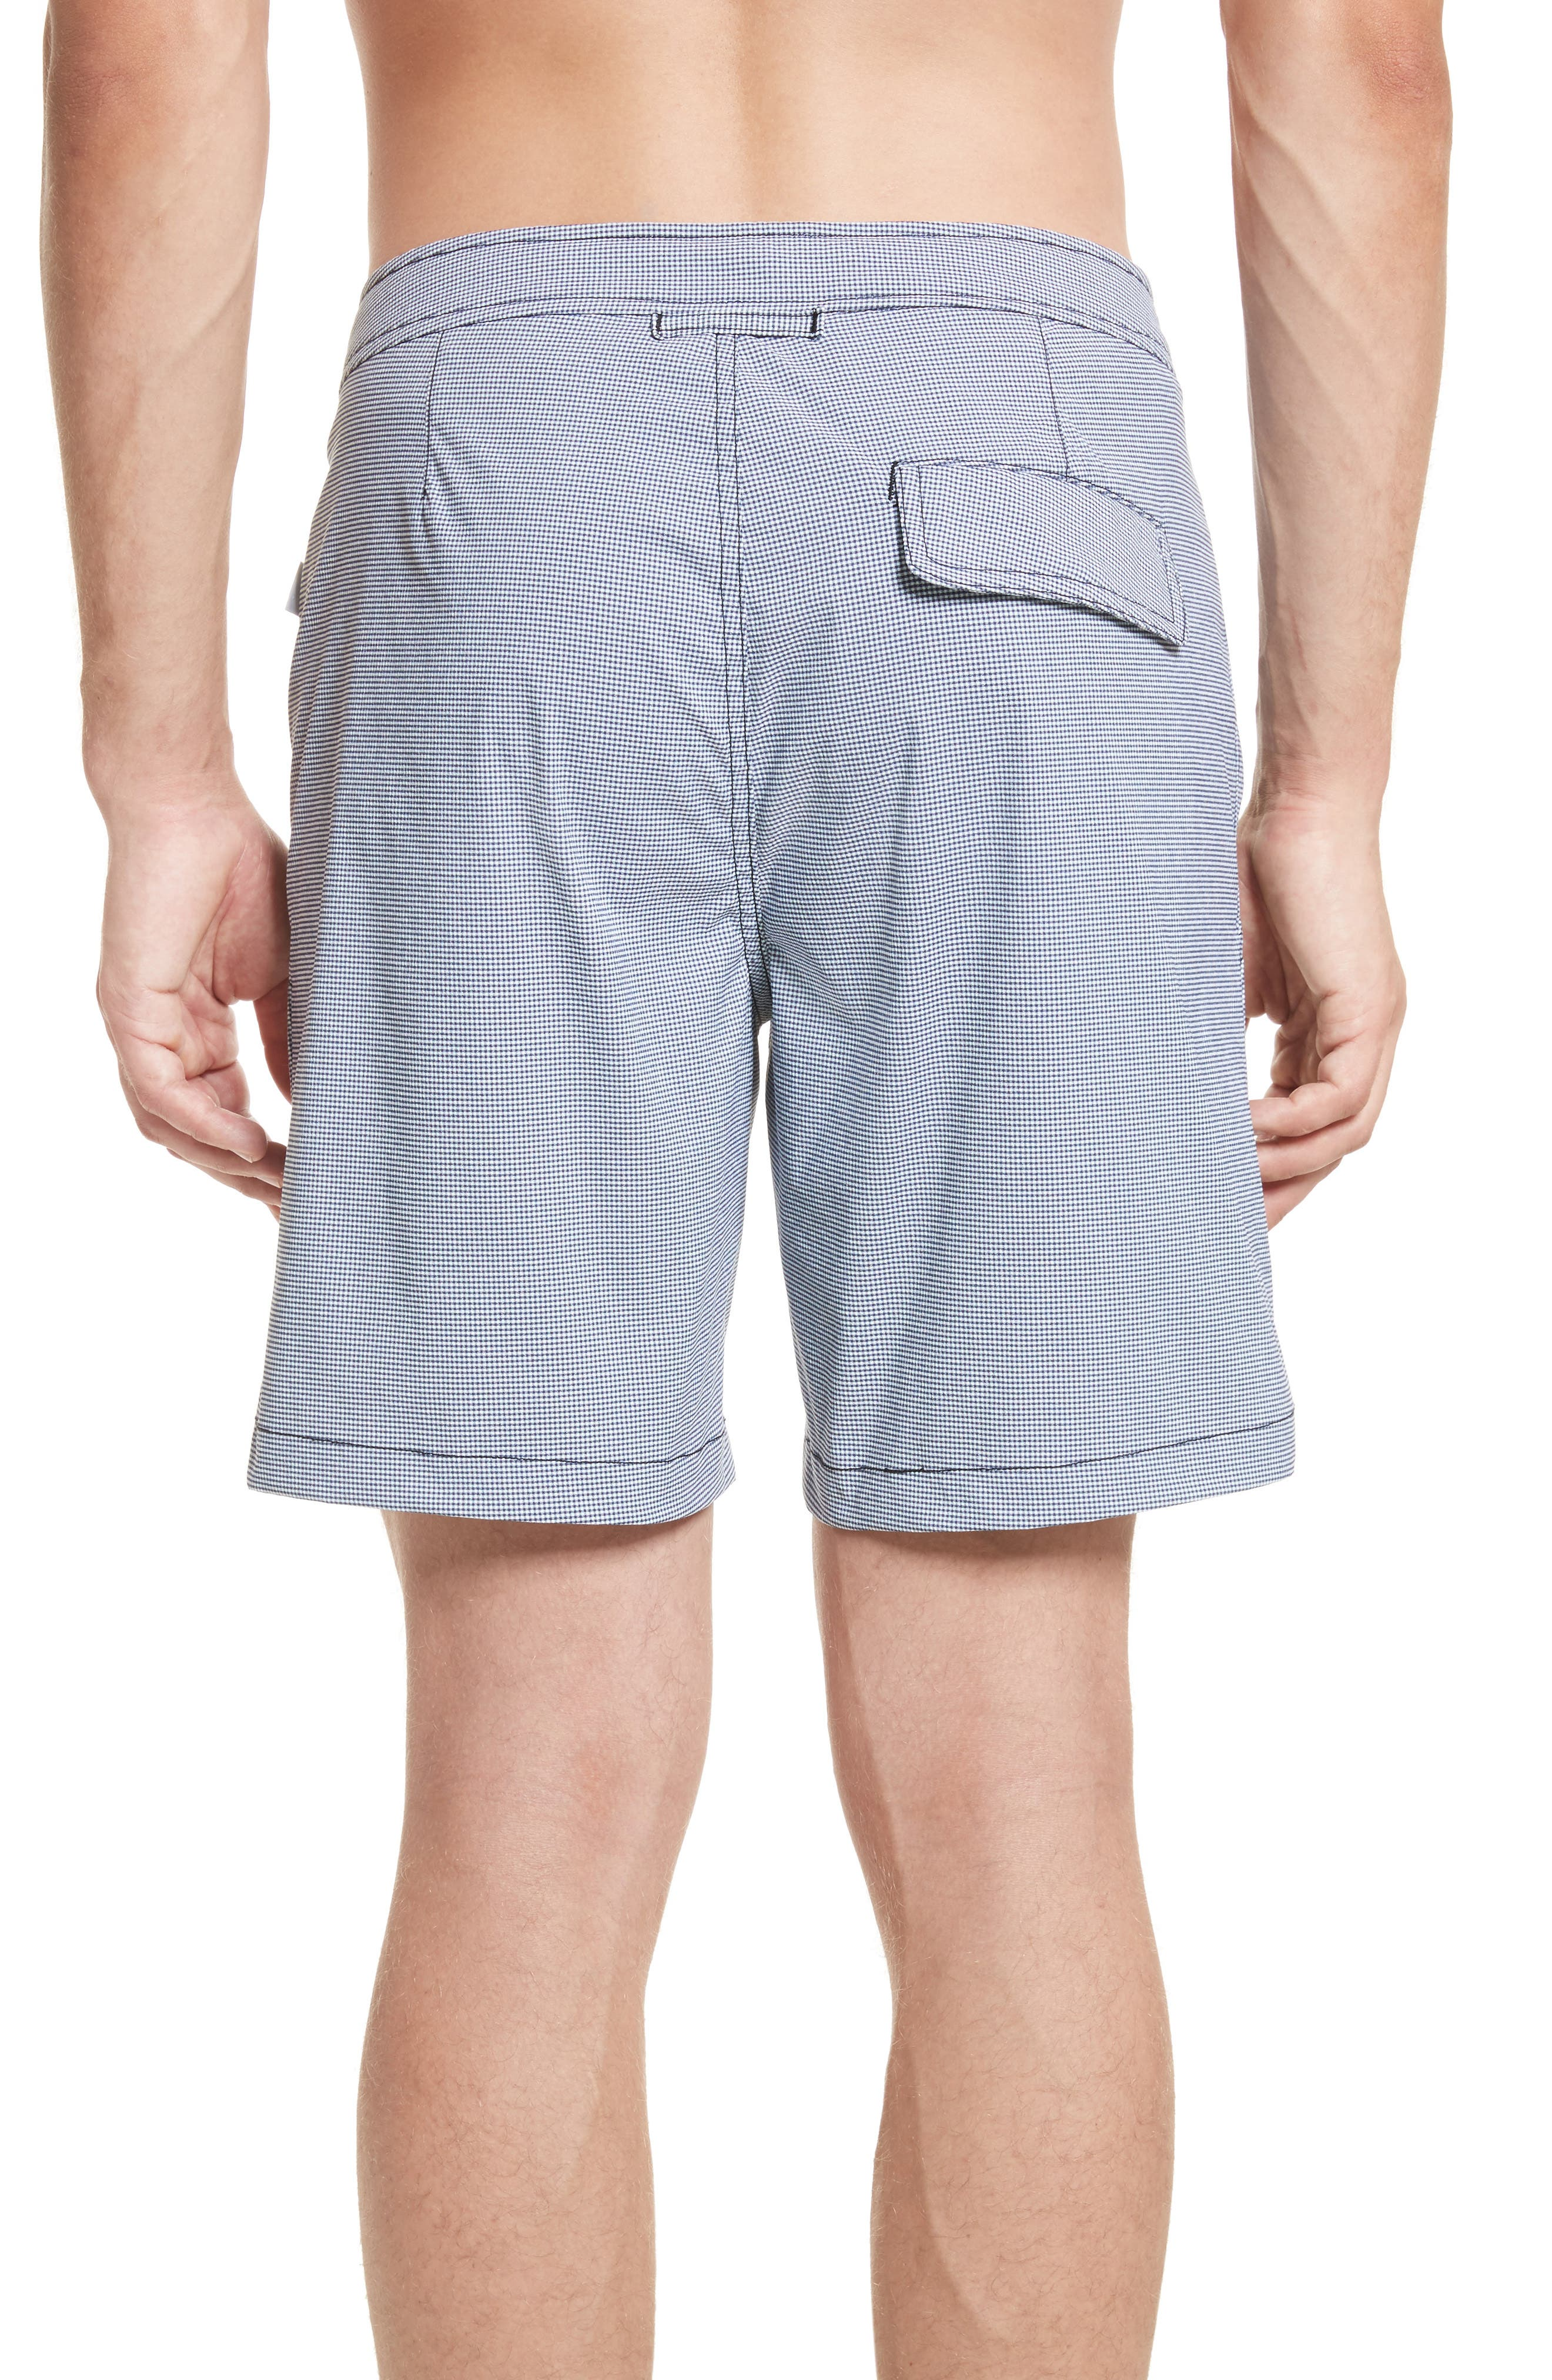 Calder Gingham Board Shorts,                             Alternate thumbnail 2, color,                             Deep Navy/White